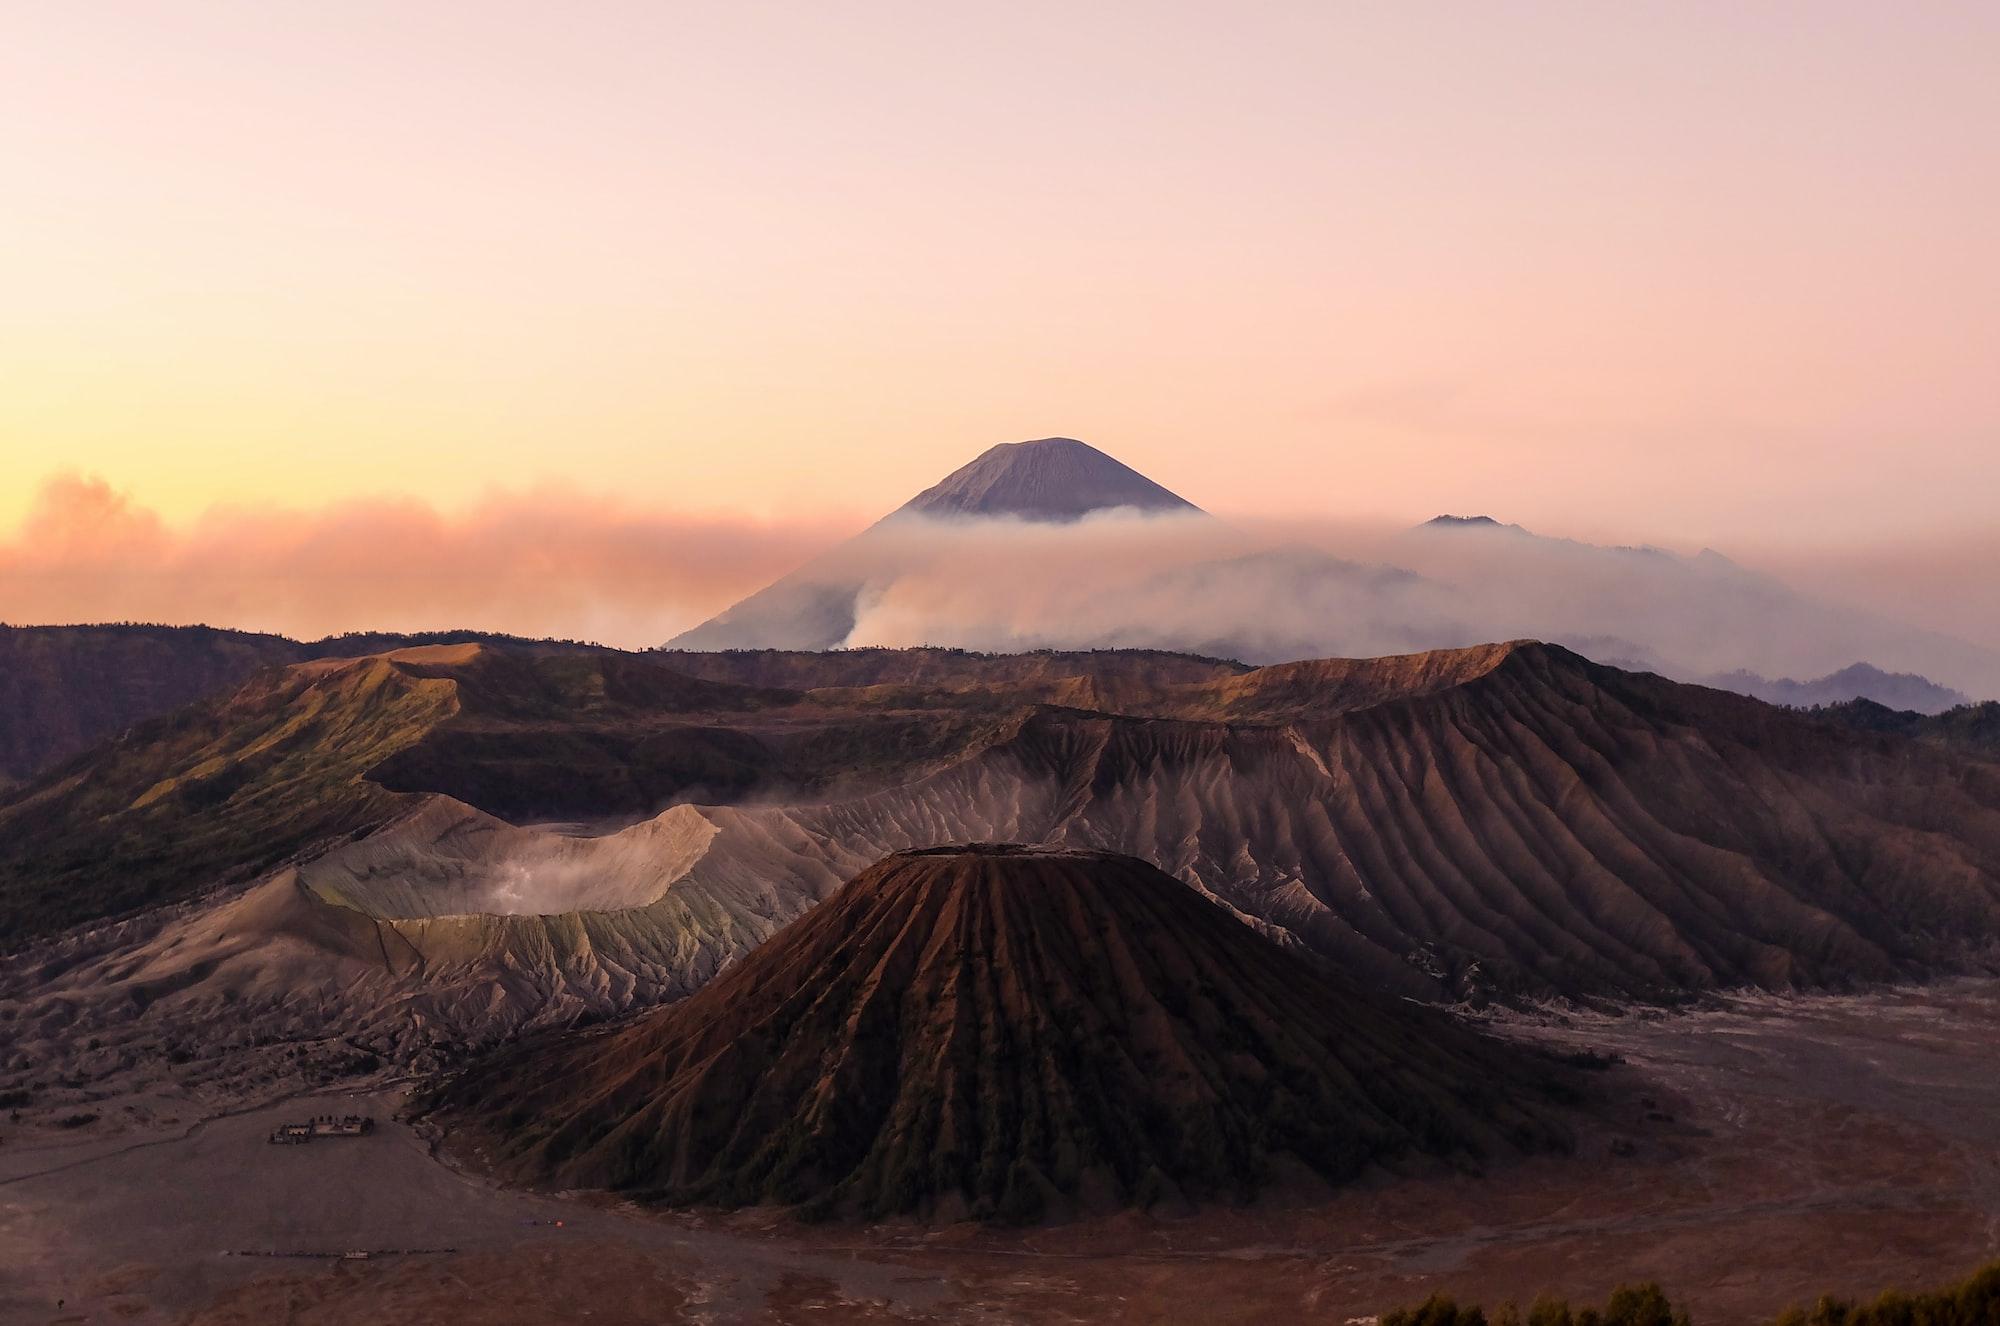 Mengenalkan Destinasi Wisata Indonesia ala Sinetron Tukang Ojek Pengkolan